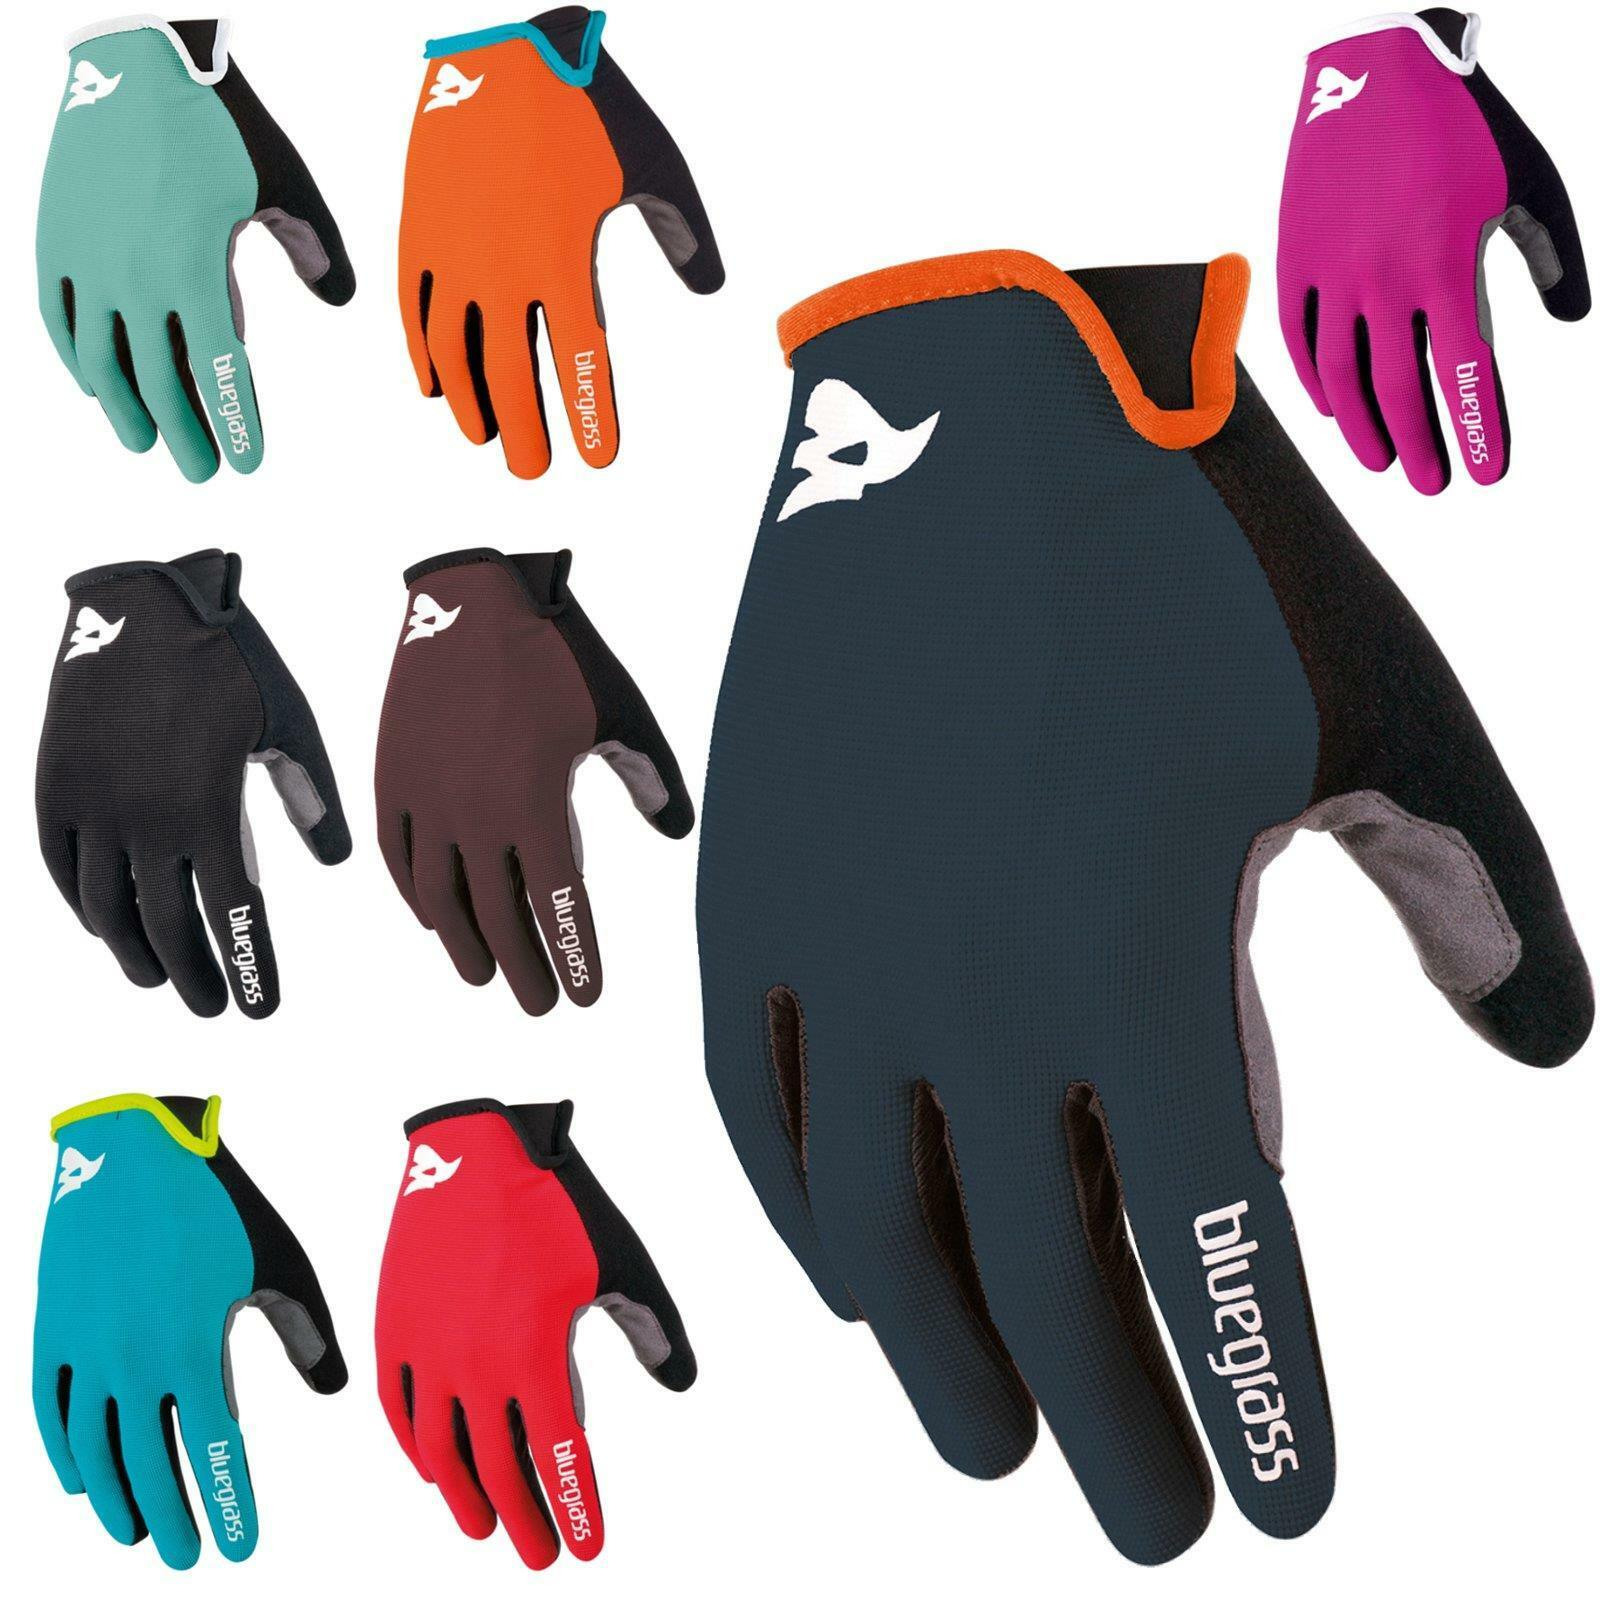 blueegrass Magnete Lite Enduro Fahrrad Handschuhe All Mountain Bike BMX Downhill